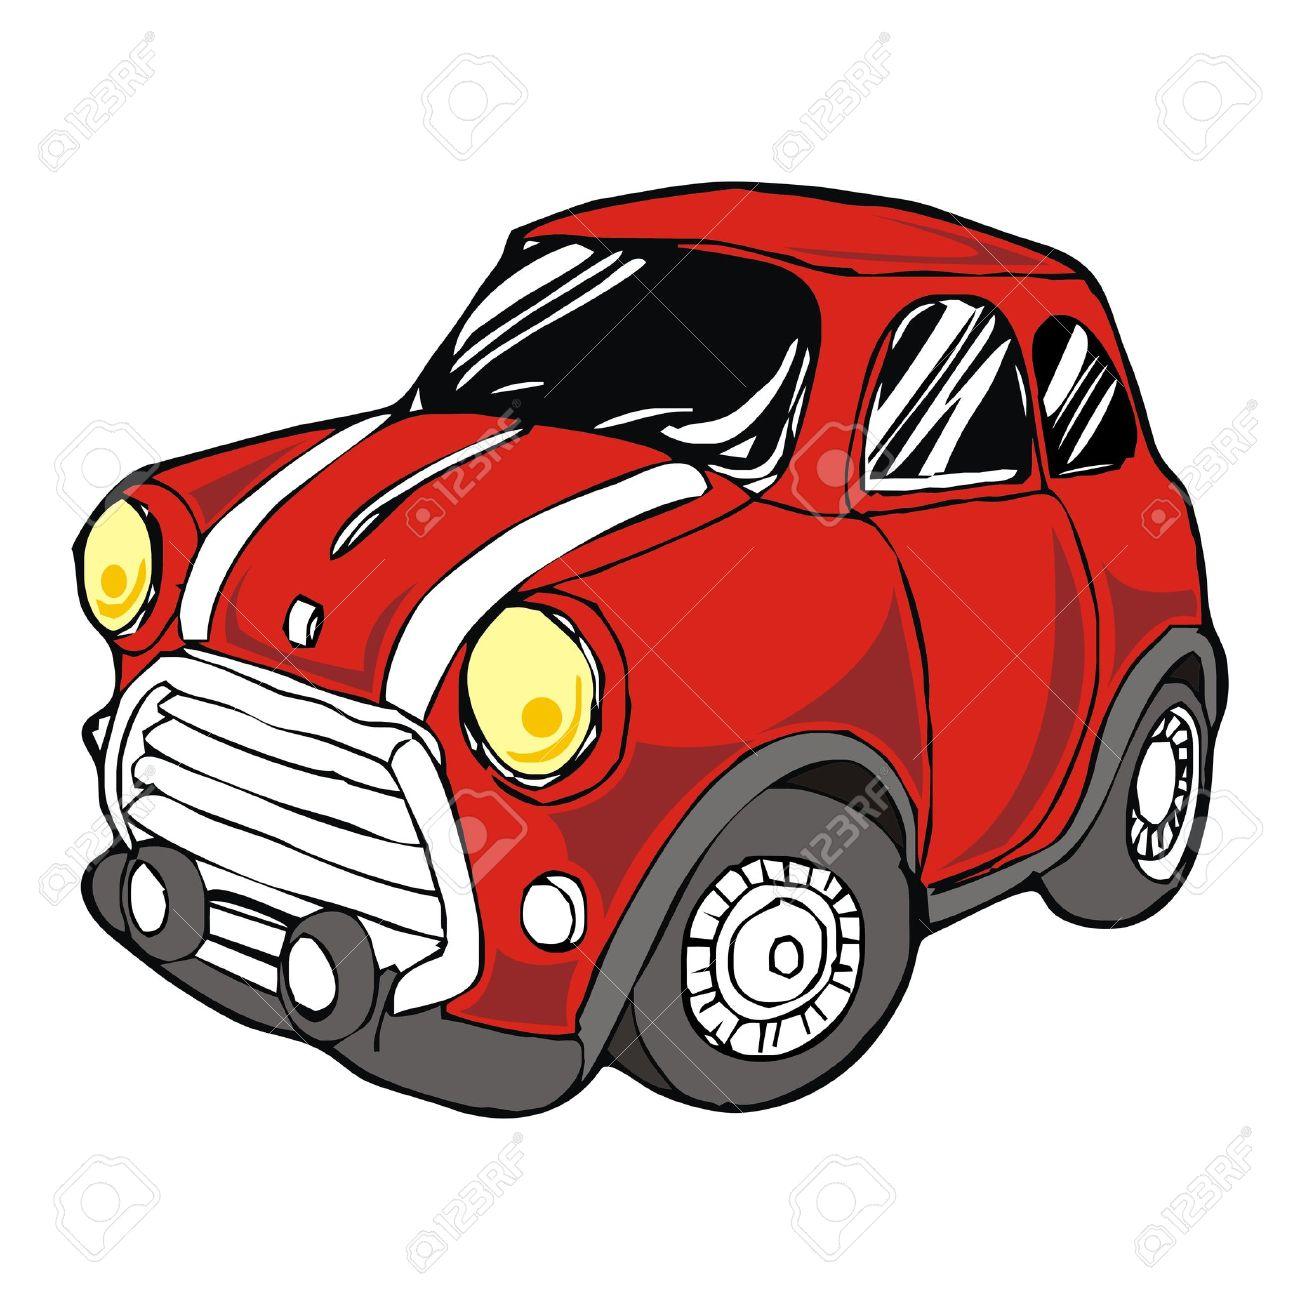 Mini Retro Red Car Cartoon Vector Royalty Free Cliparts Vectors